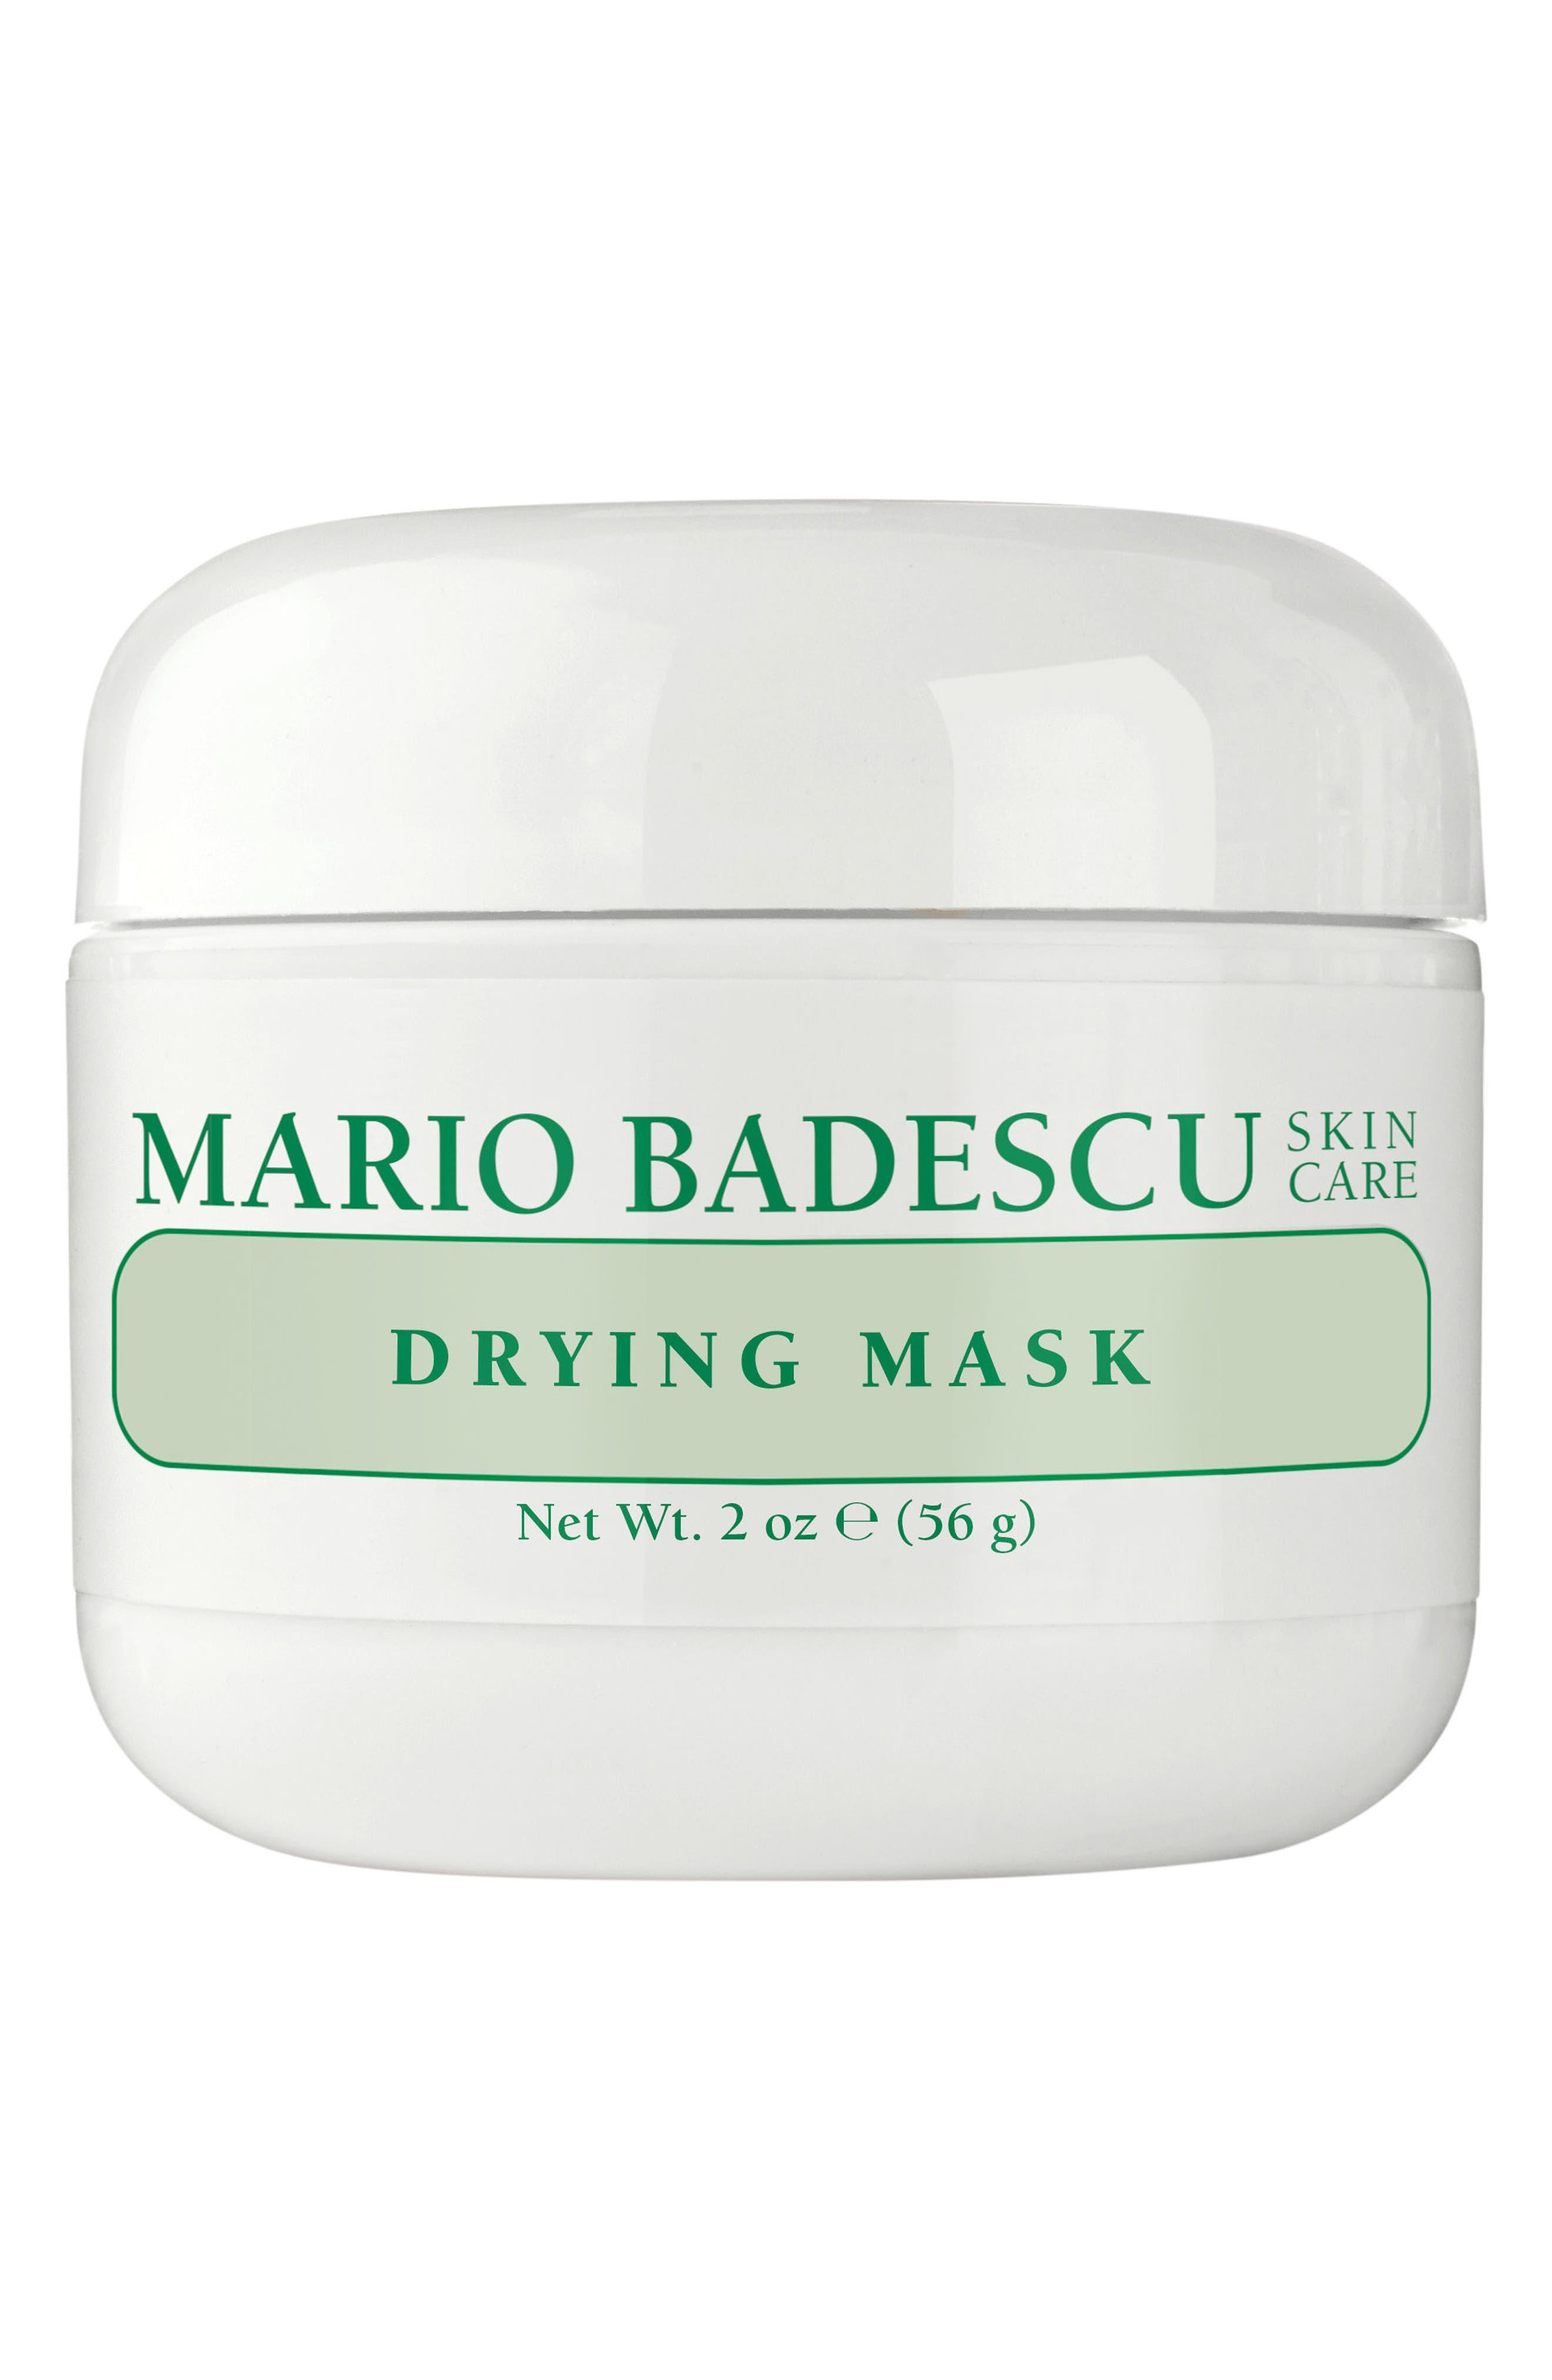 MARIO BADESCU Drying Mask, Main, color, NO COLOR